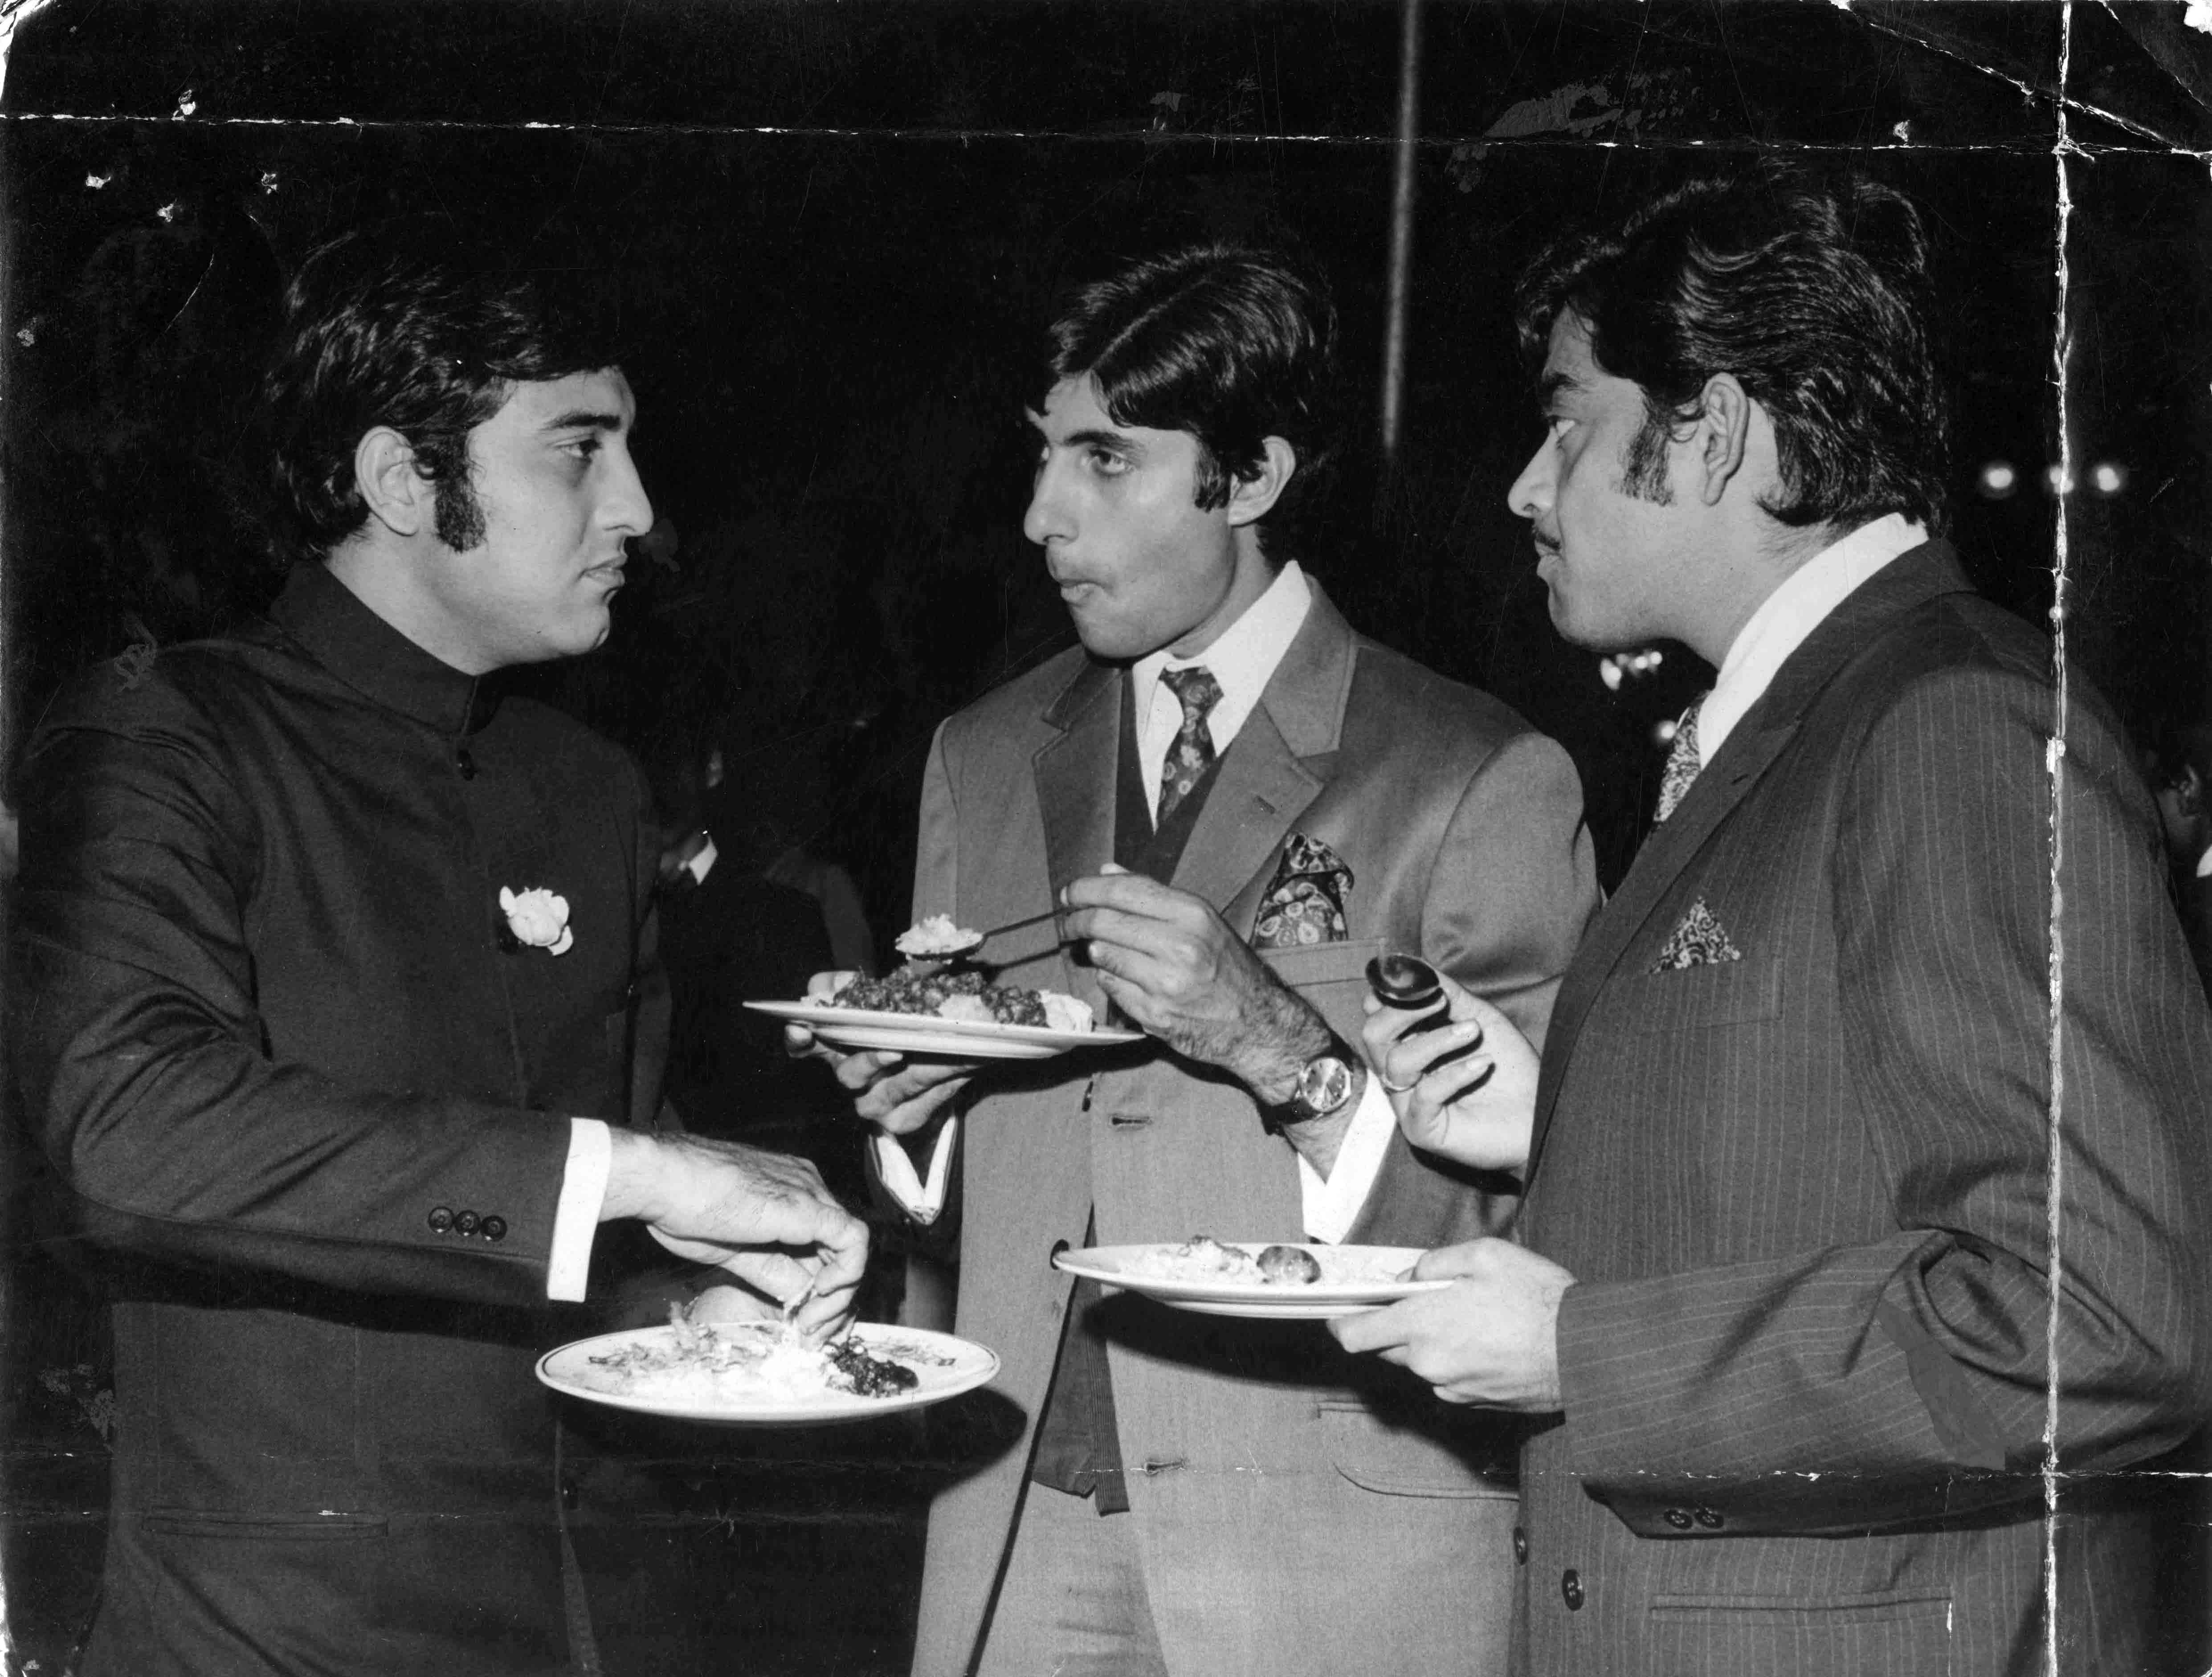 Film star Vinod Khanna, Amitabh Bachchan and Shatrughan Sinha. *** Local Caption *** Film star Vinod Khanna, Amitabh Bachchan and Shatrughan Sinha. Express archive photo